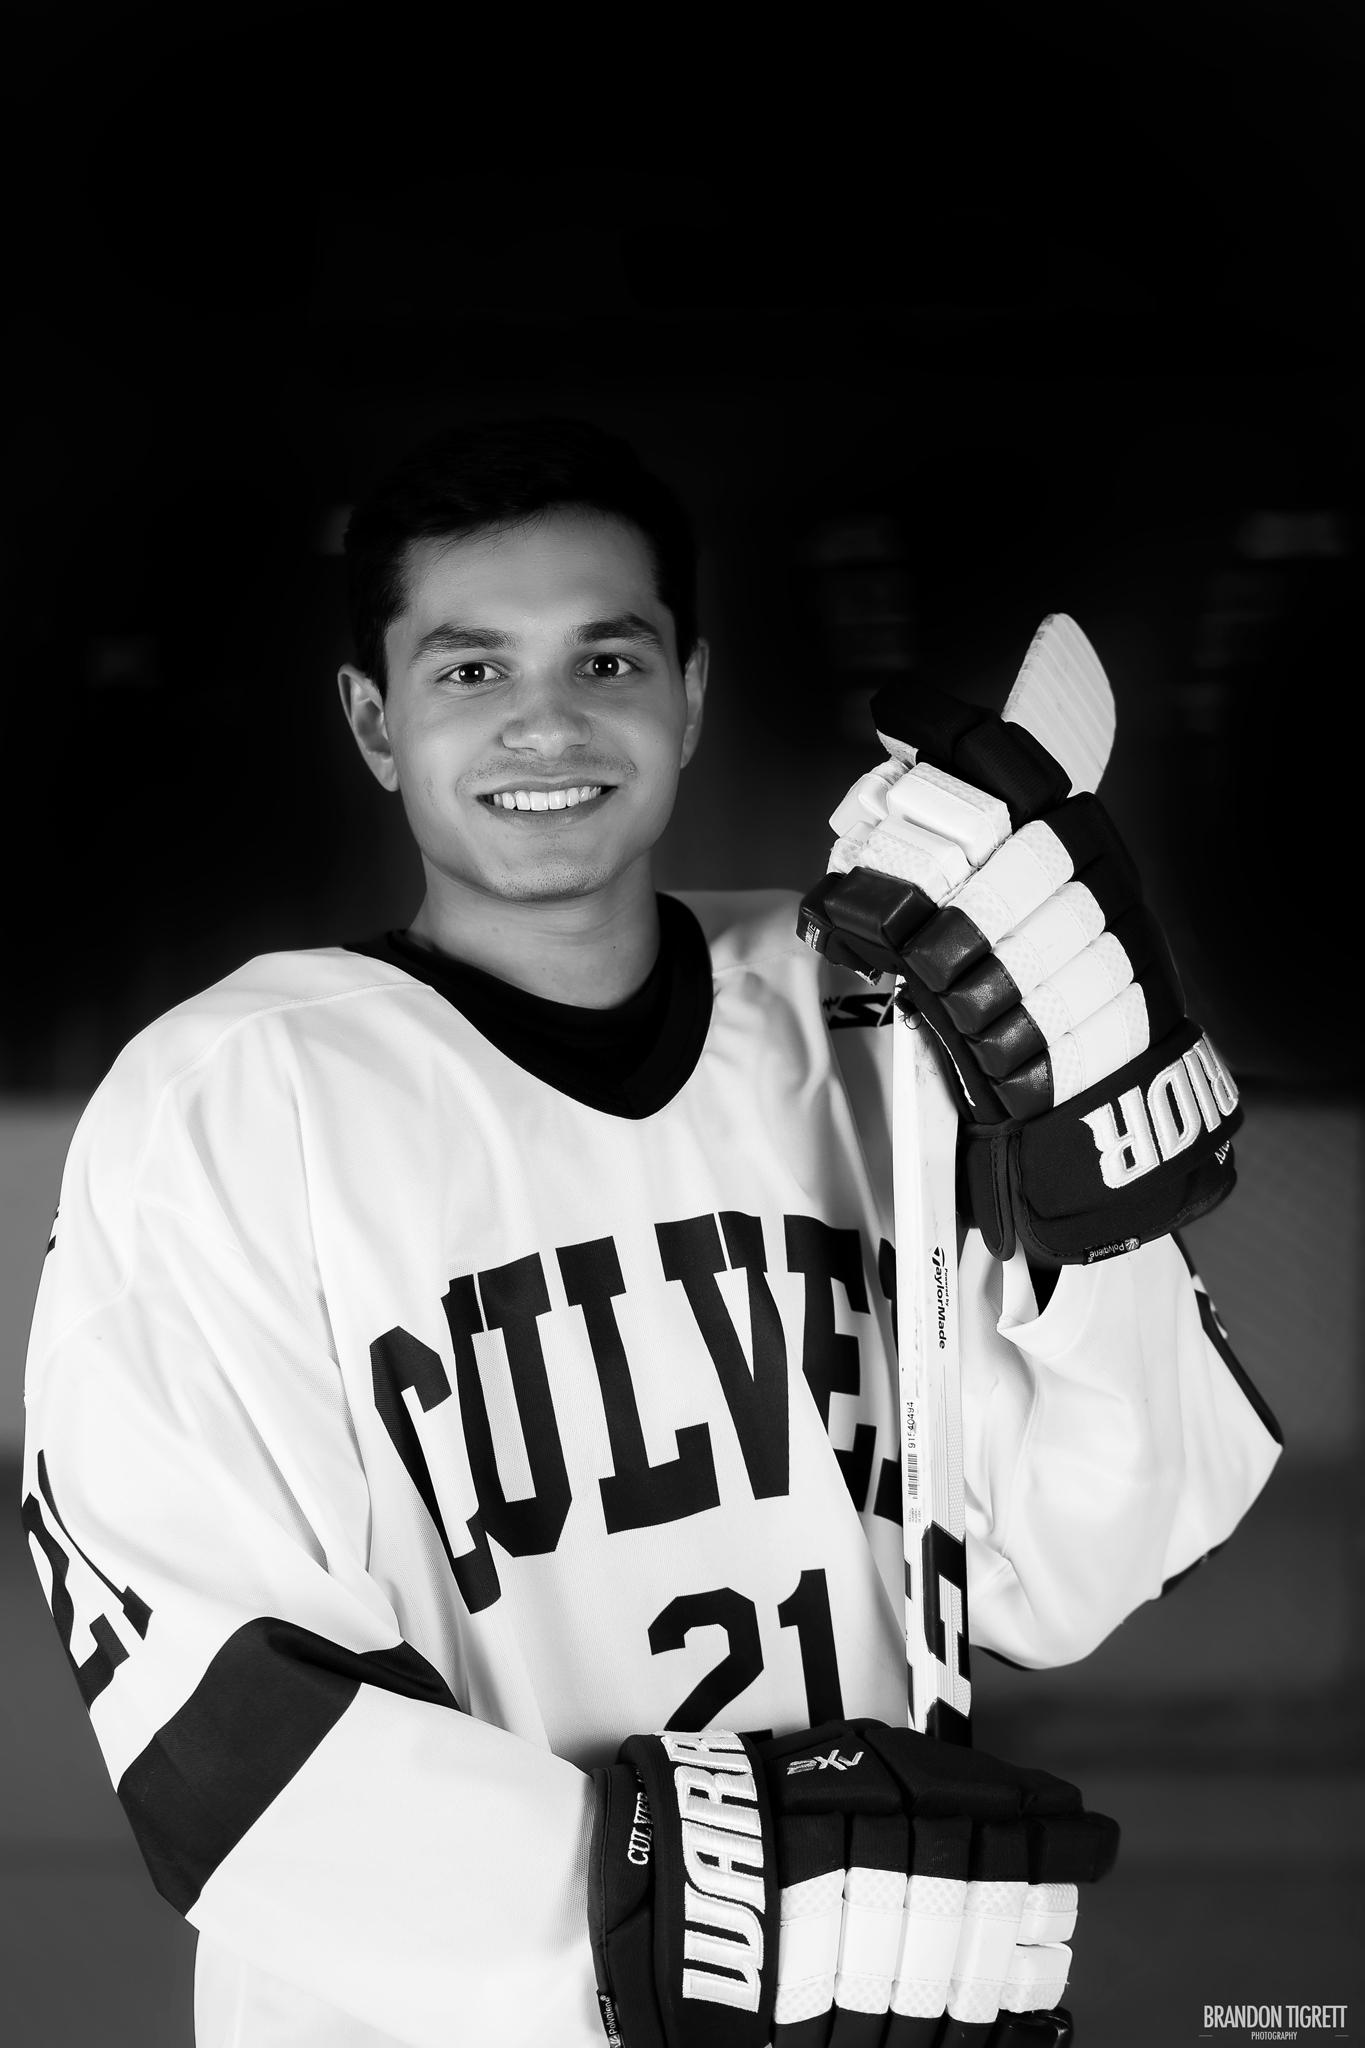 Culver Academy High School Senior Hockey Player